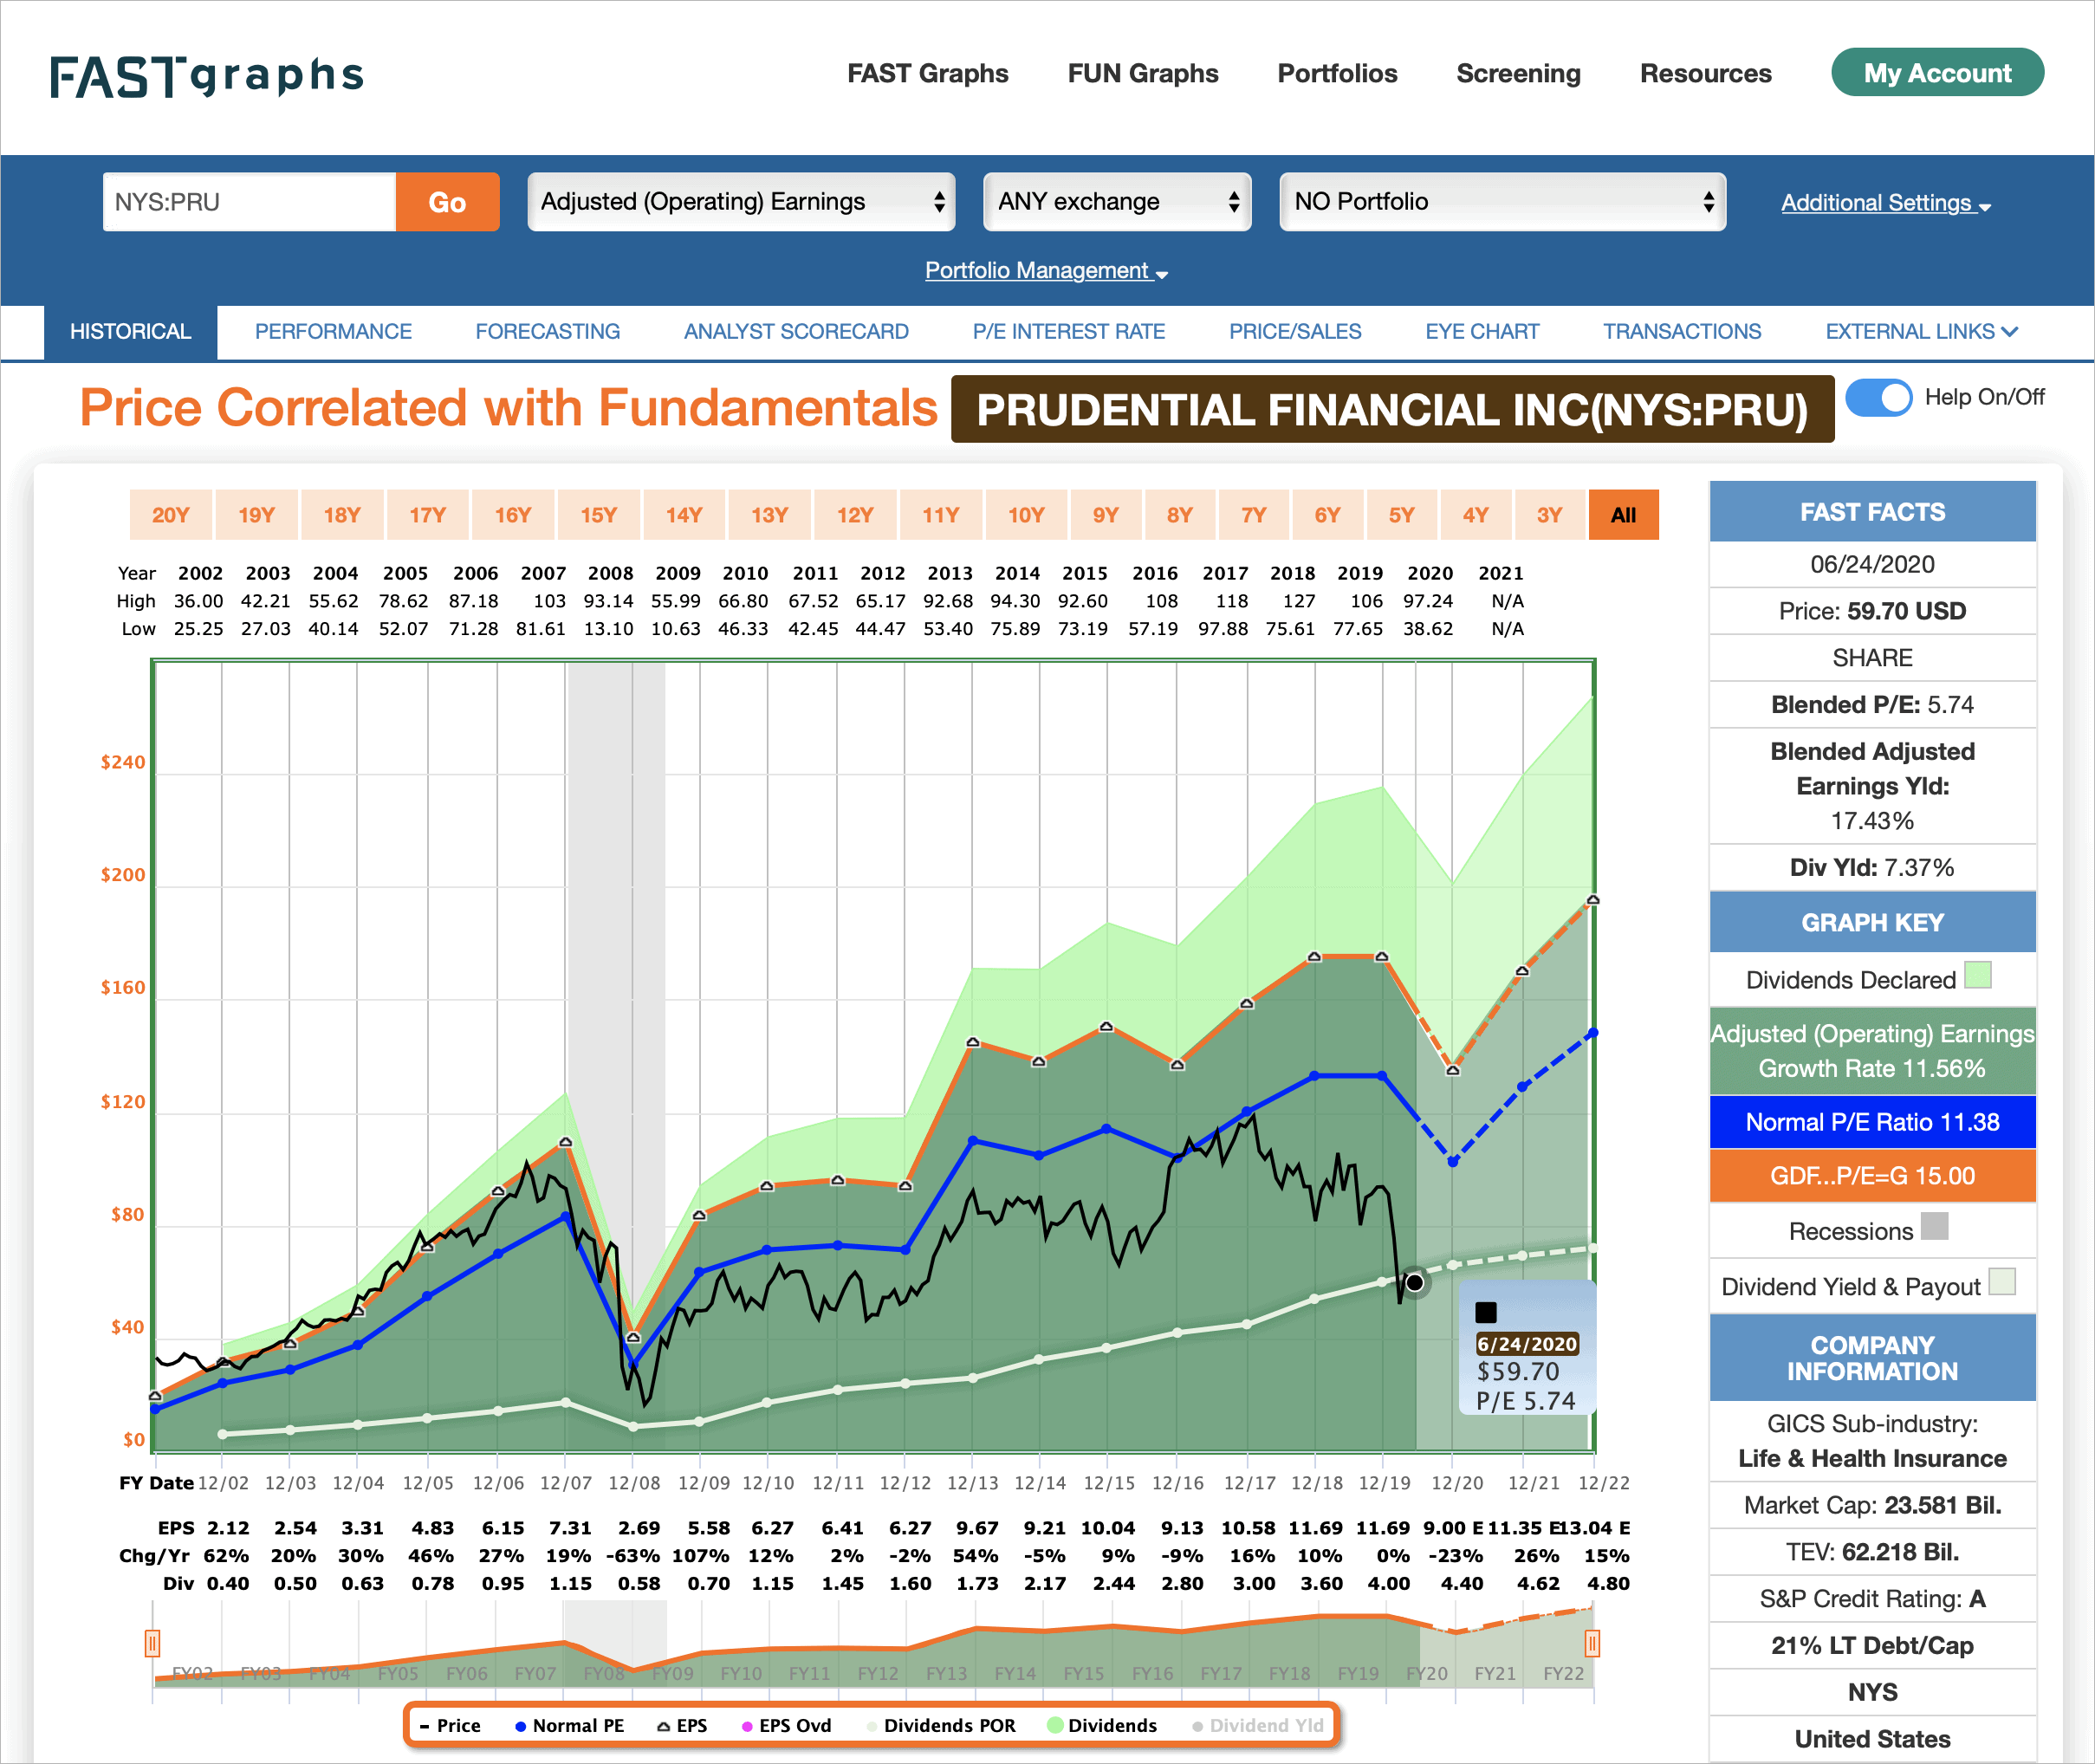 Analiza spółki FAST Graphs